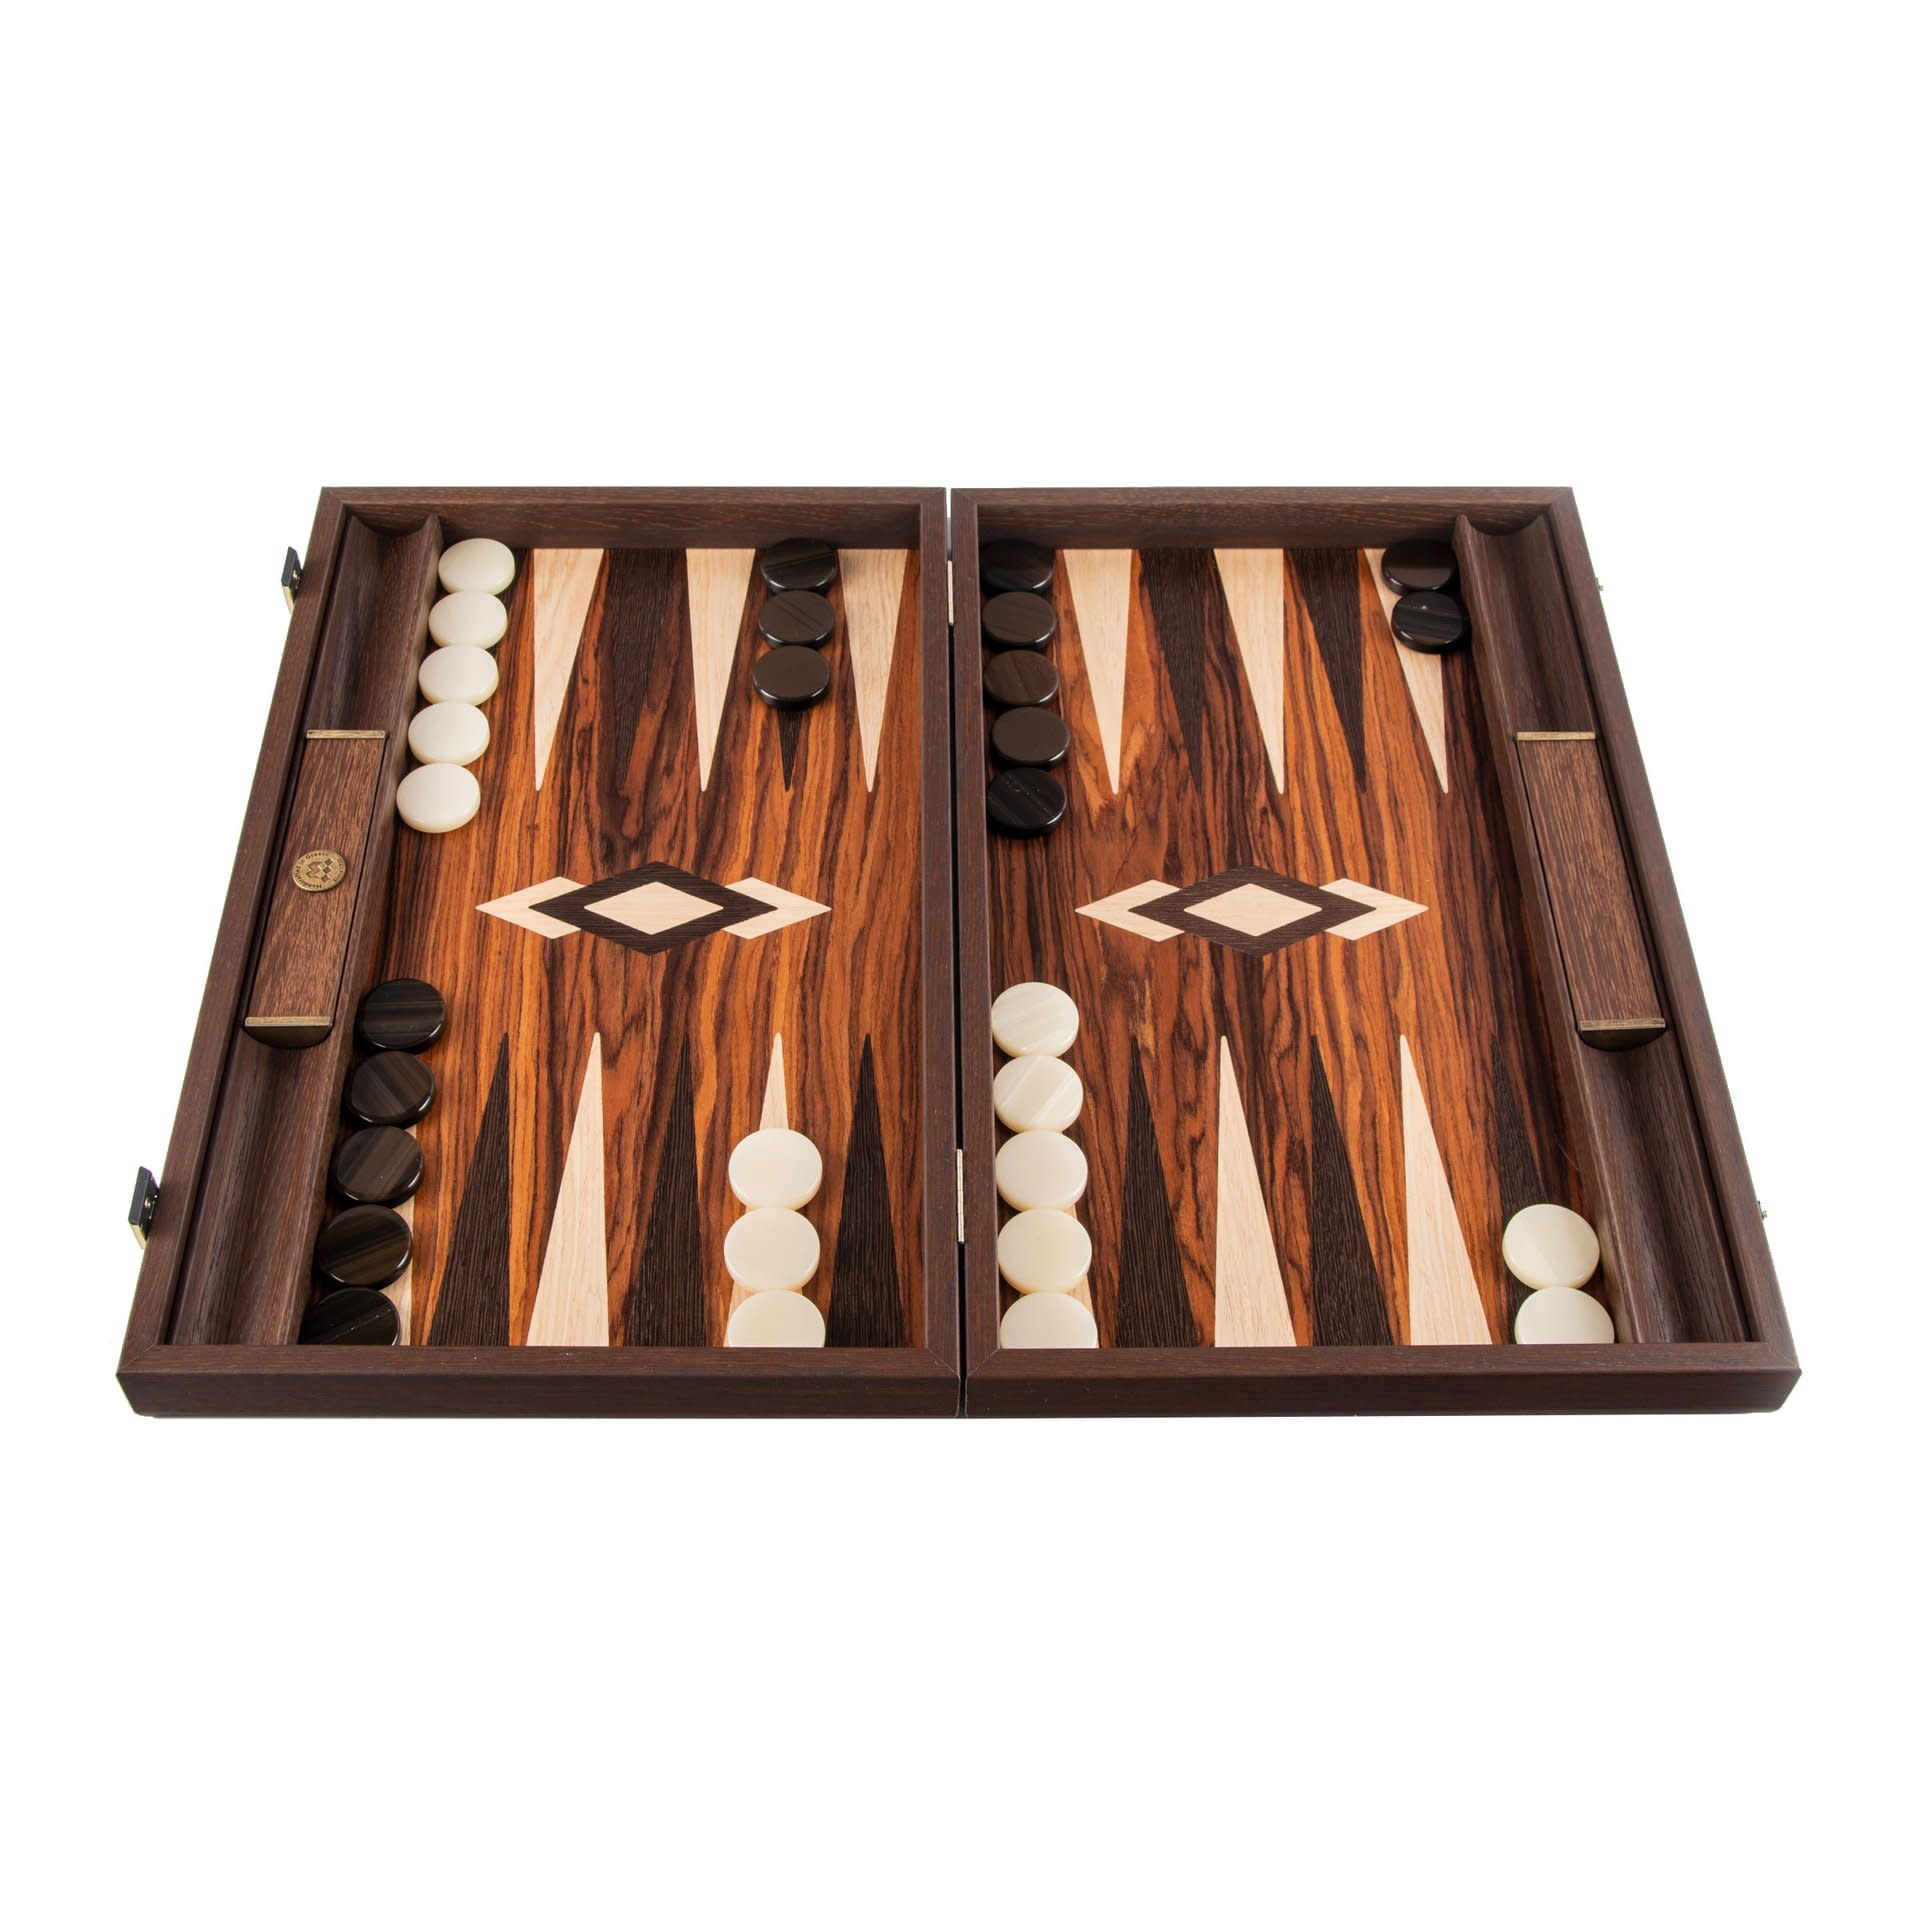 Brown Wood Backgammon Games-1